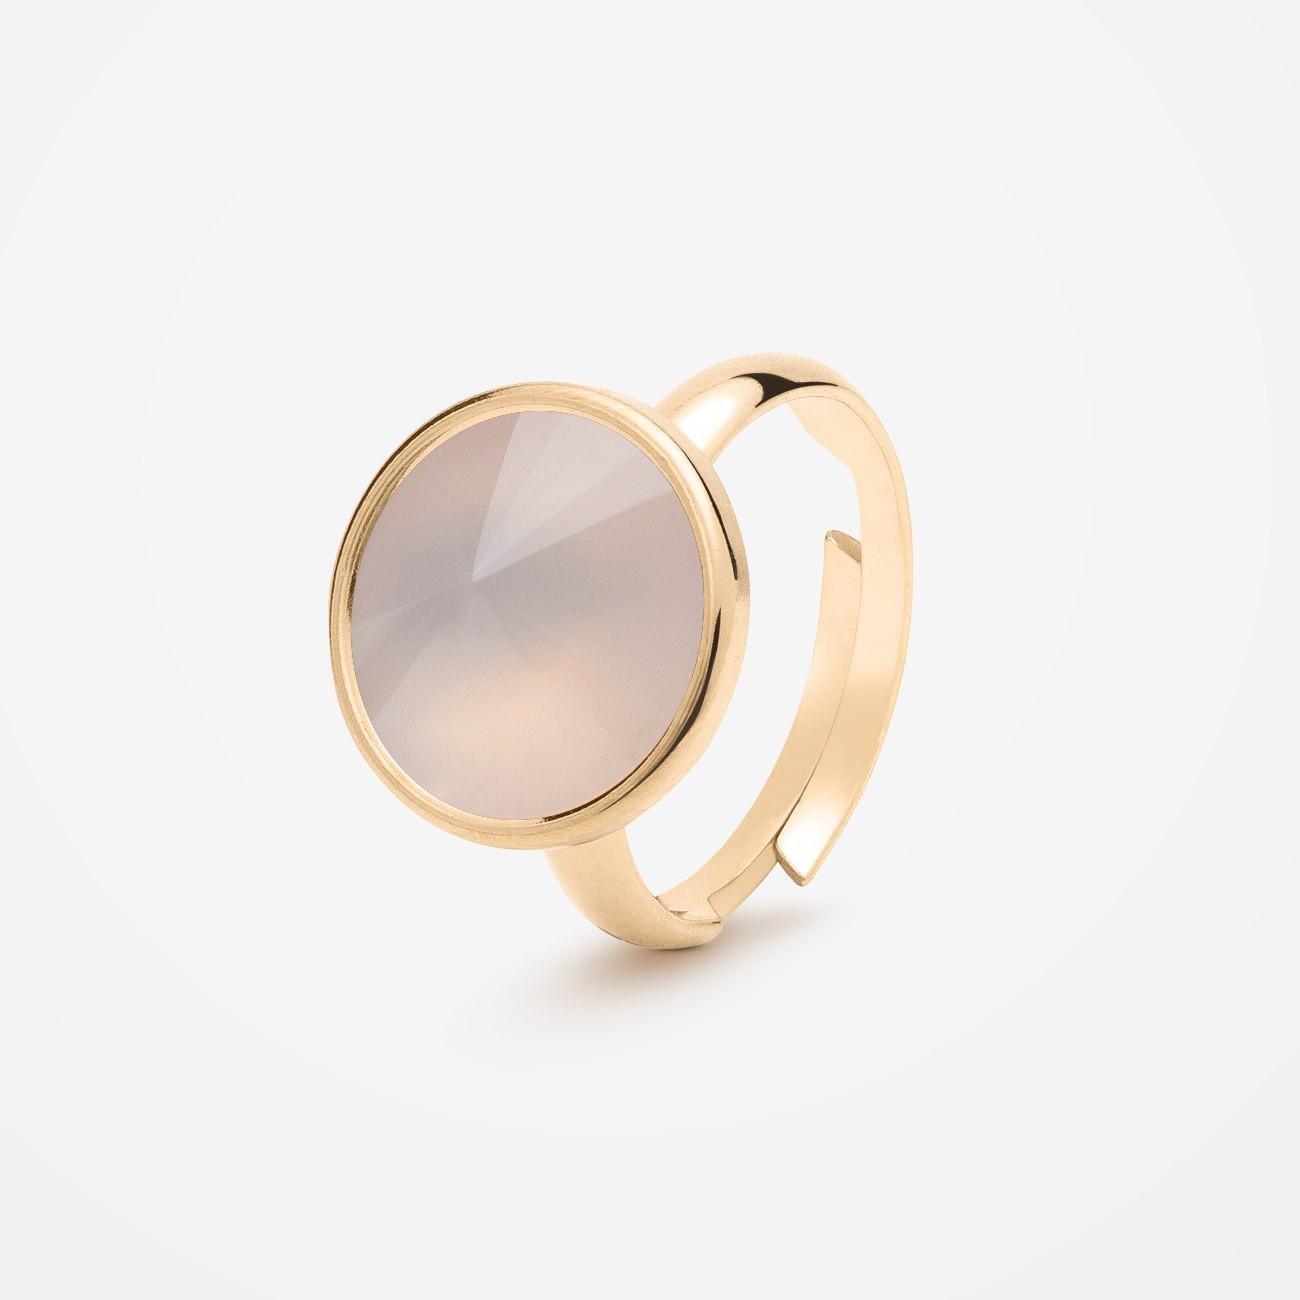 Srebrny pierścionek z kwarcem, srebro 925